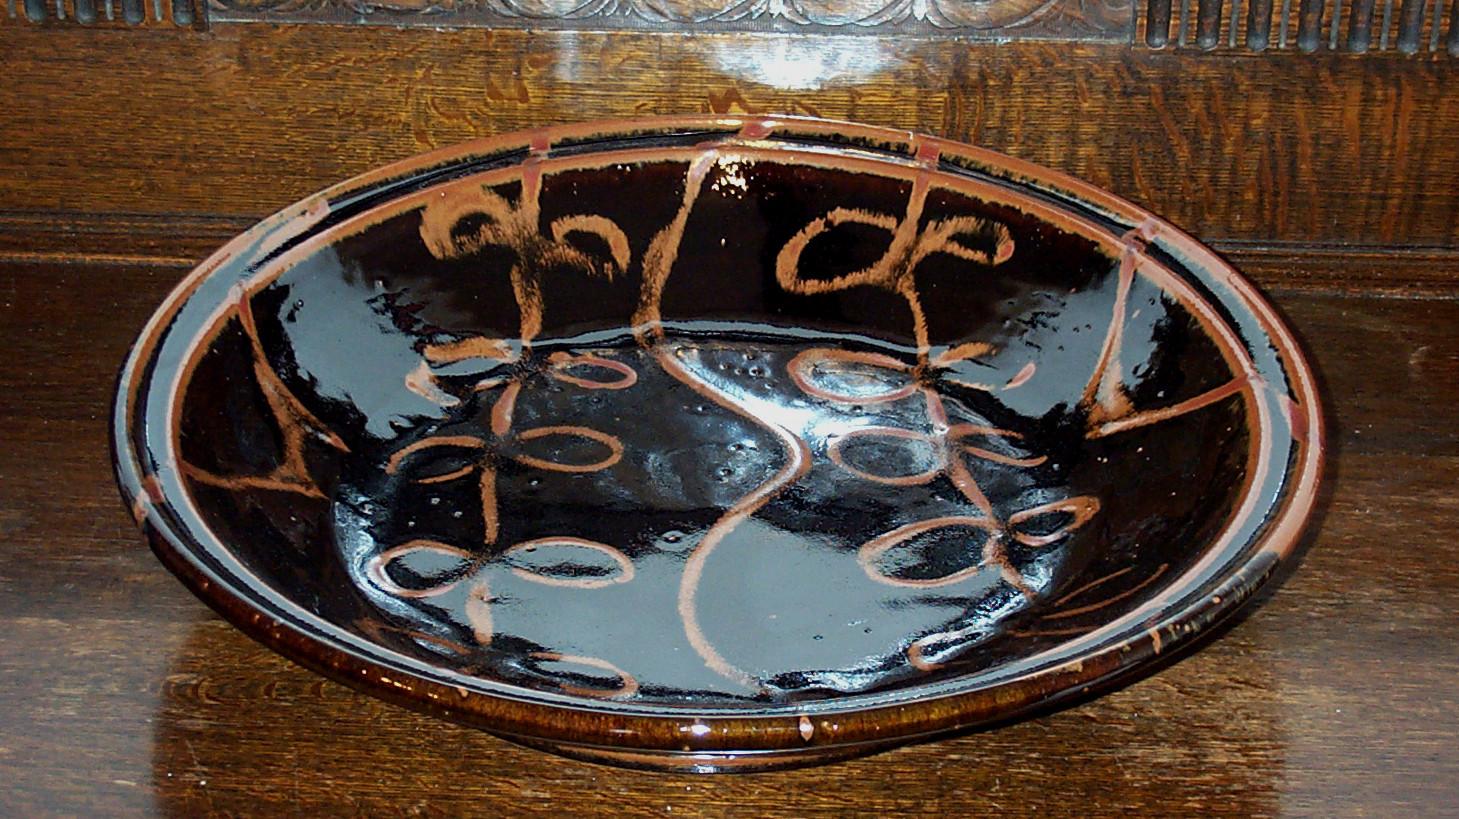 853 - large dish.jpg